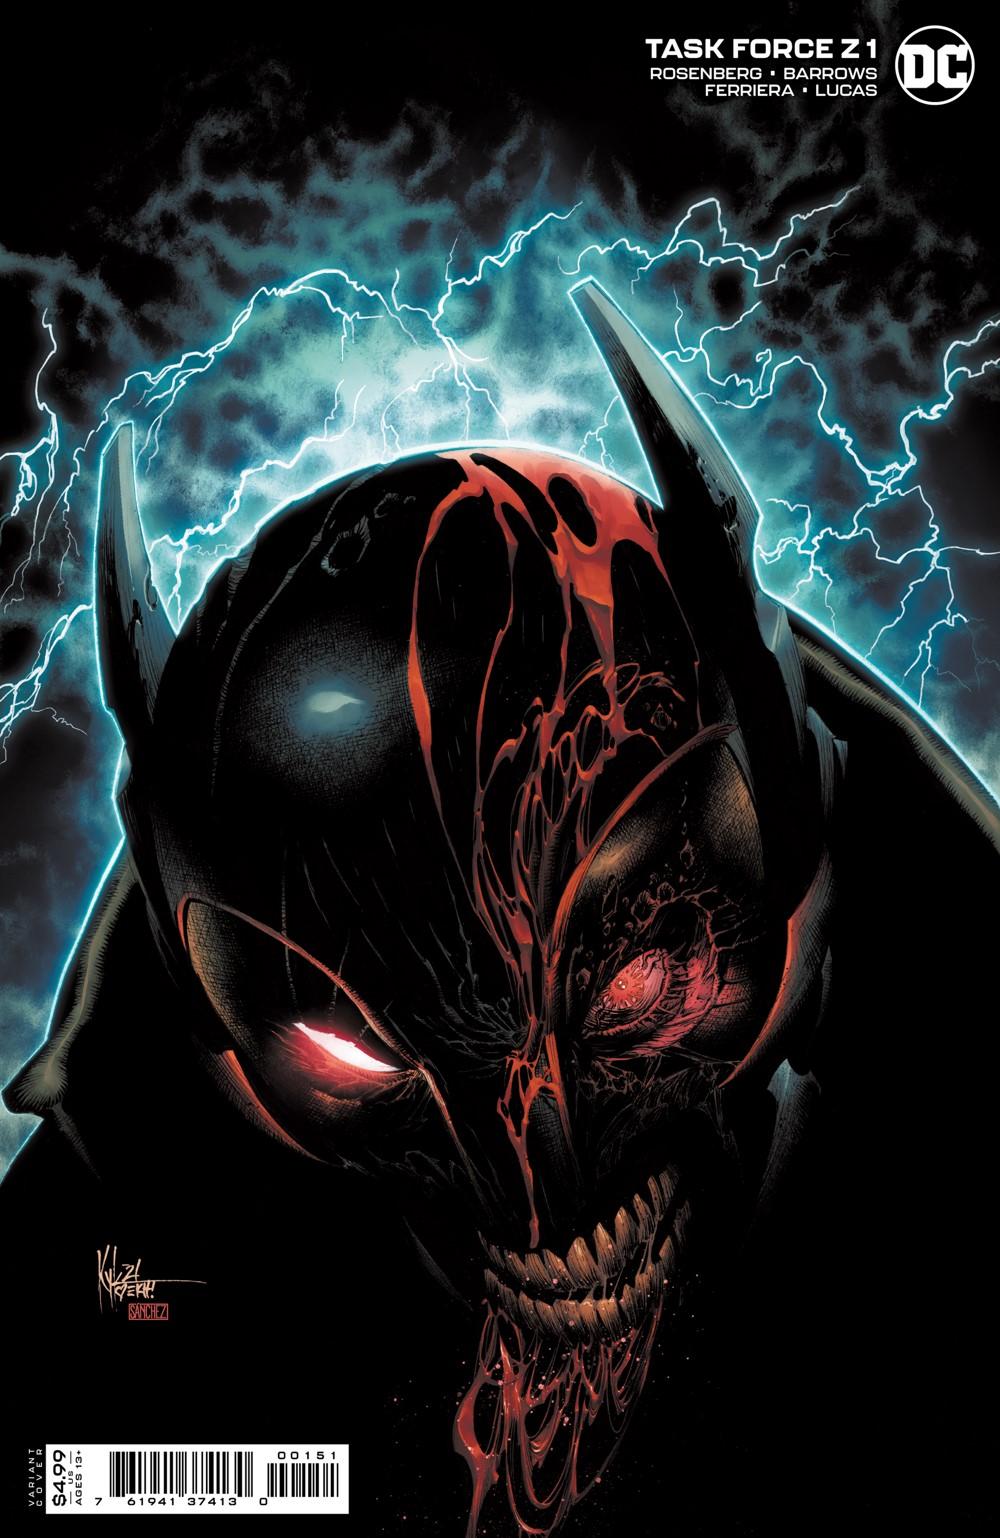 TFZ_Cv1_1in50_var_00151 DC Comics October 2021 Solicitations